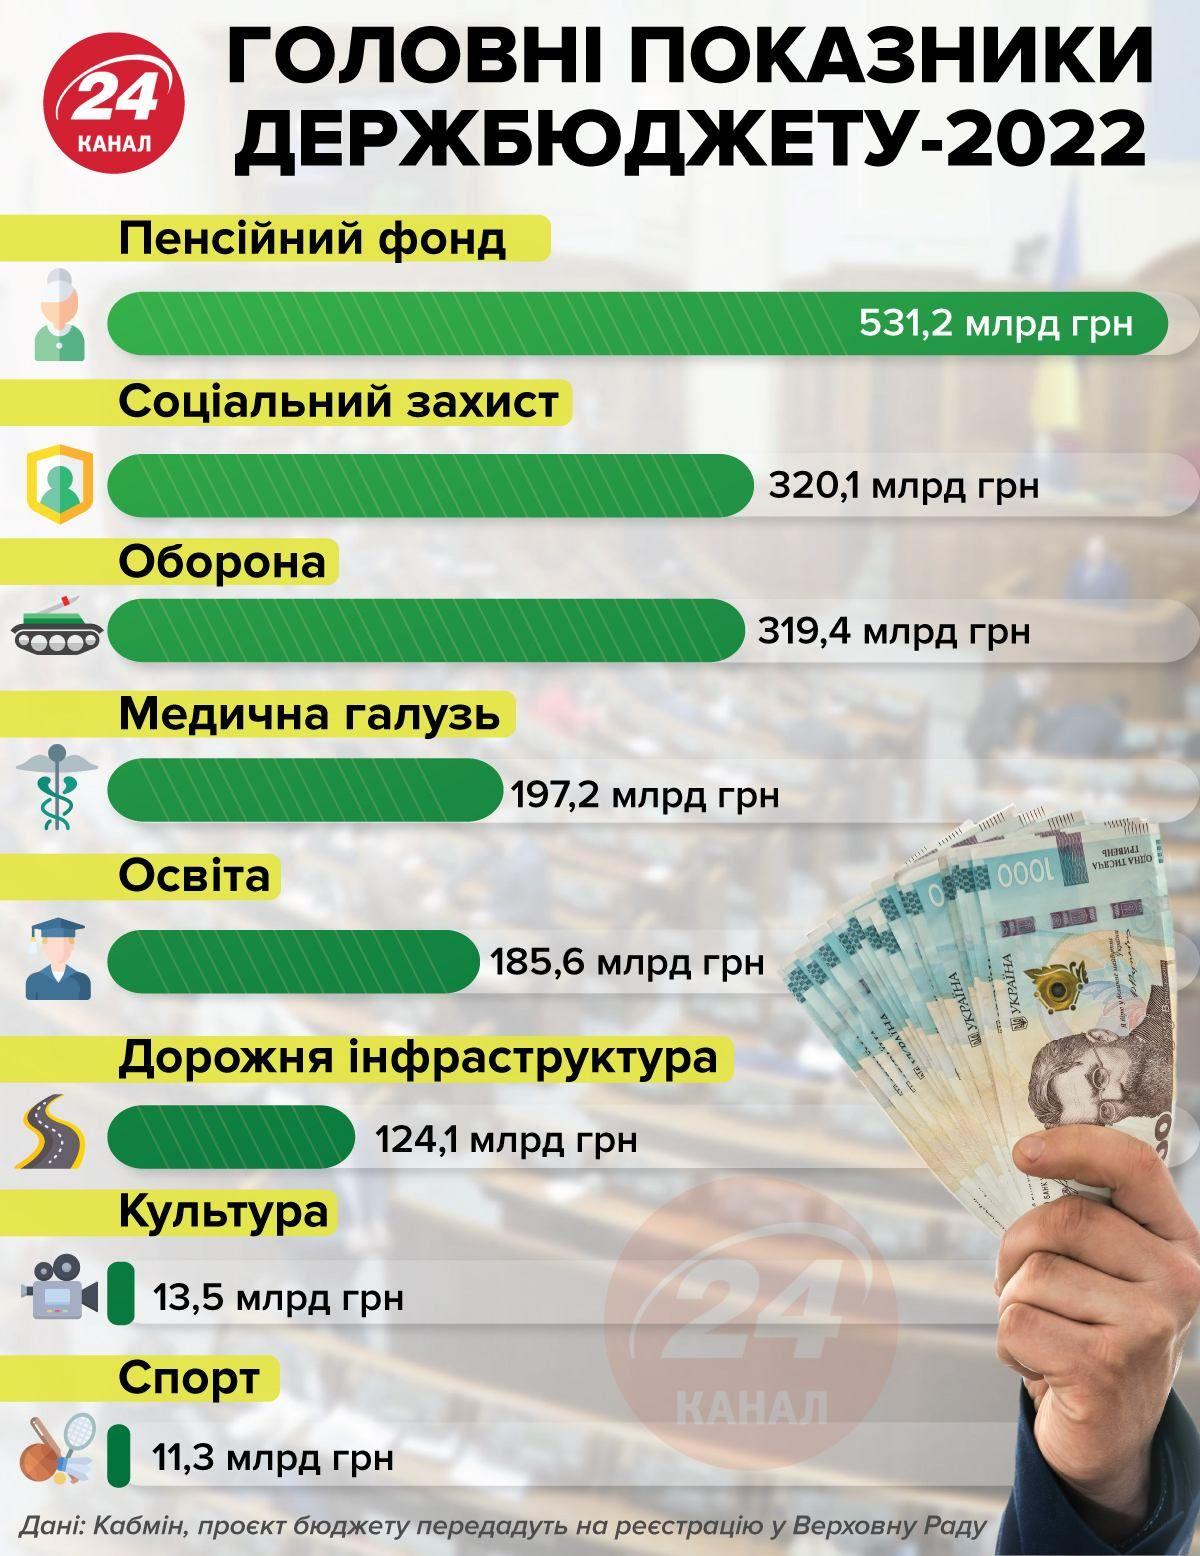 Статистика Держбюджету-2022